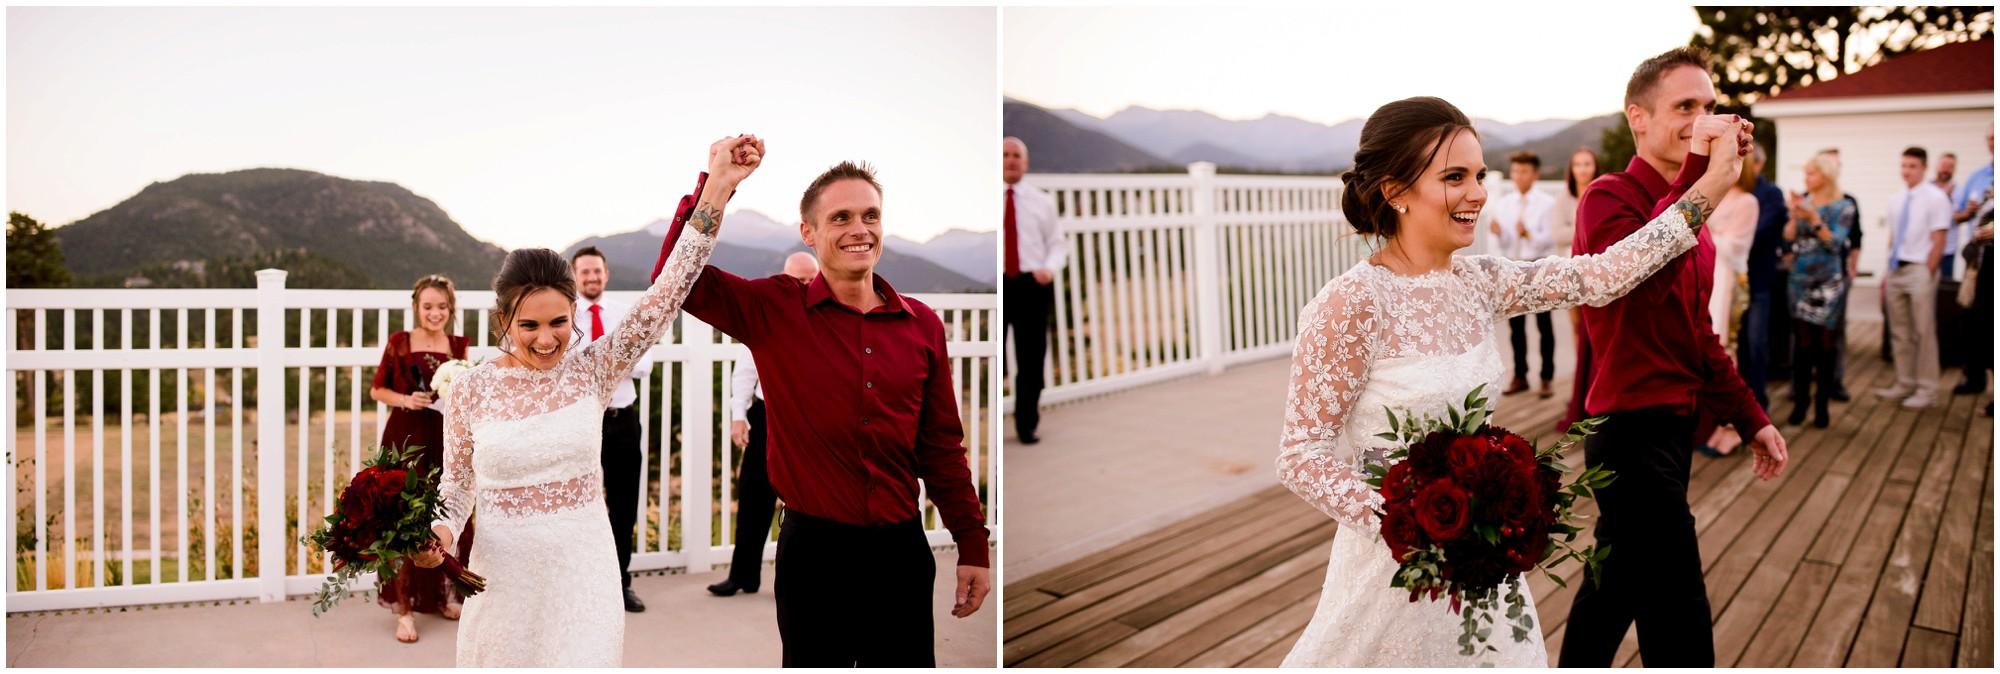 197-Estes-Park-Stanley-hotel-fall-wedding.jpg